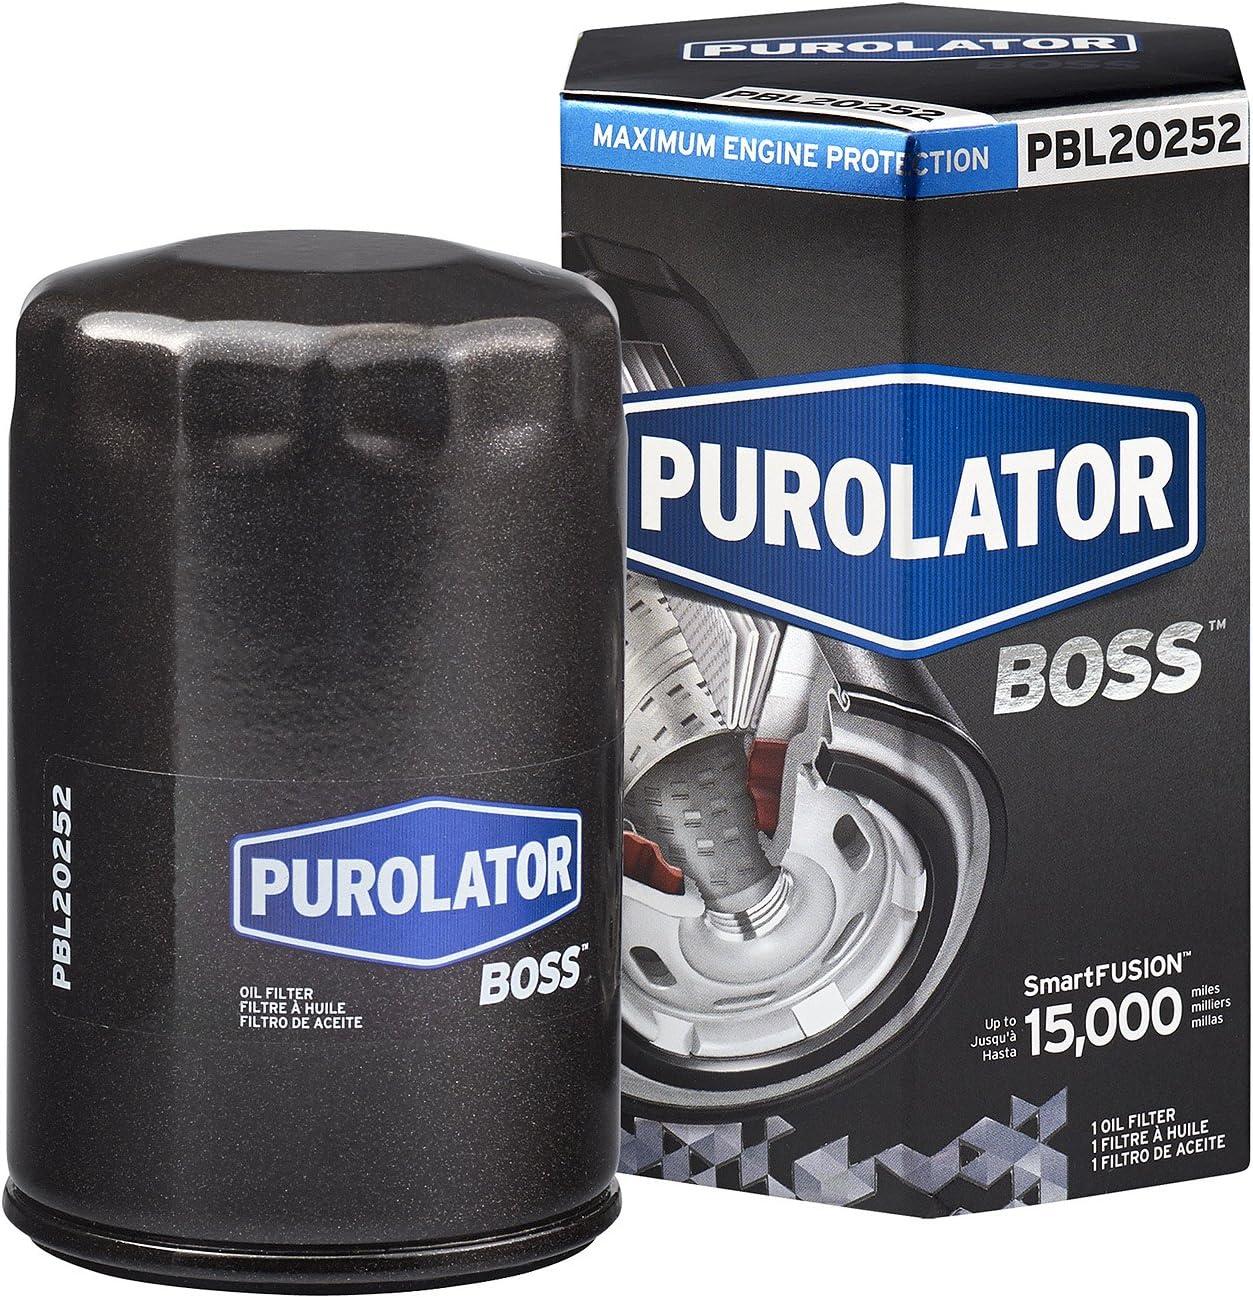 Purolator PBL20252 PurolatorBOSS Maximum Engine Protection Spin On Oil Filter